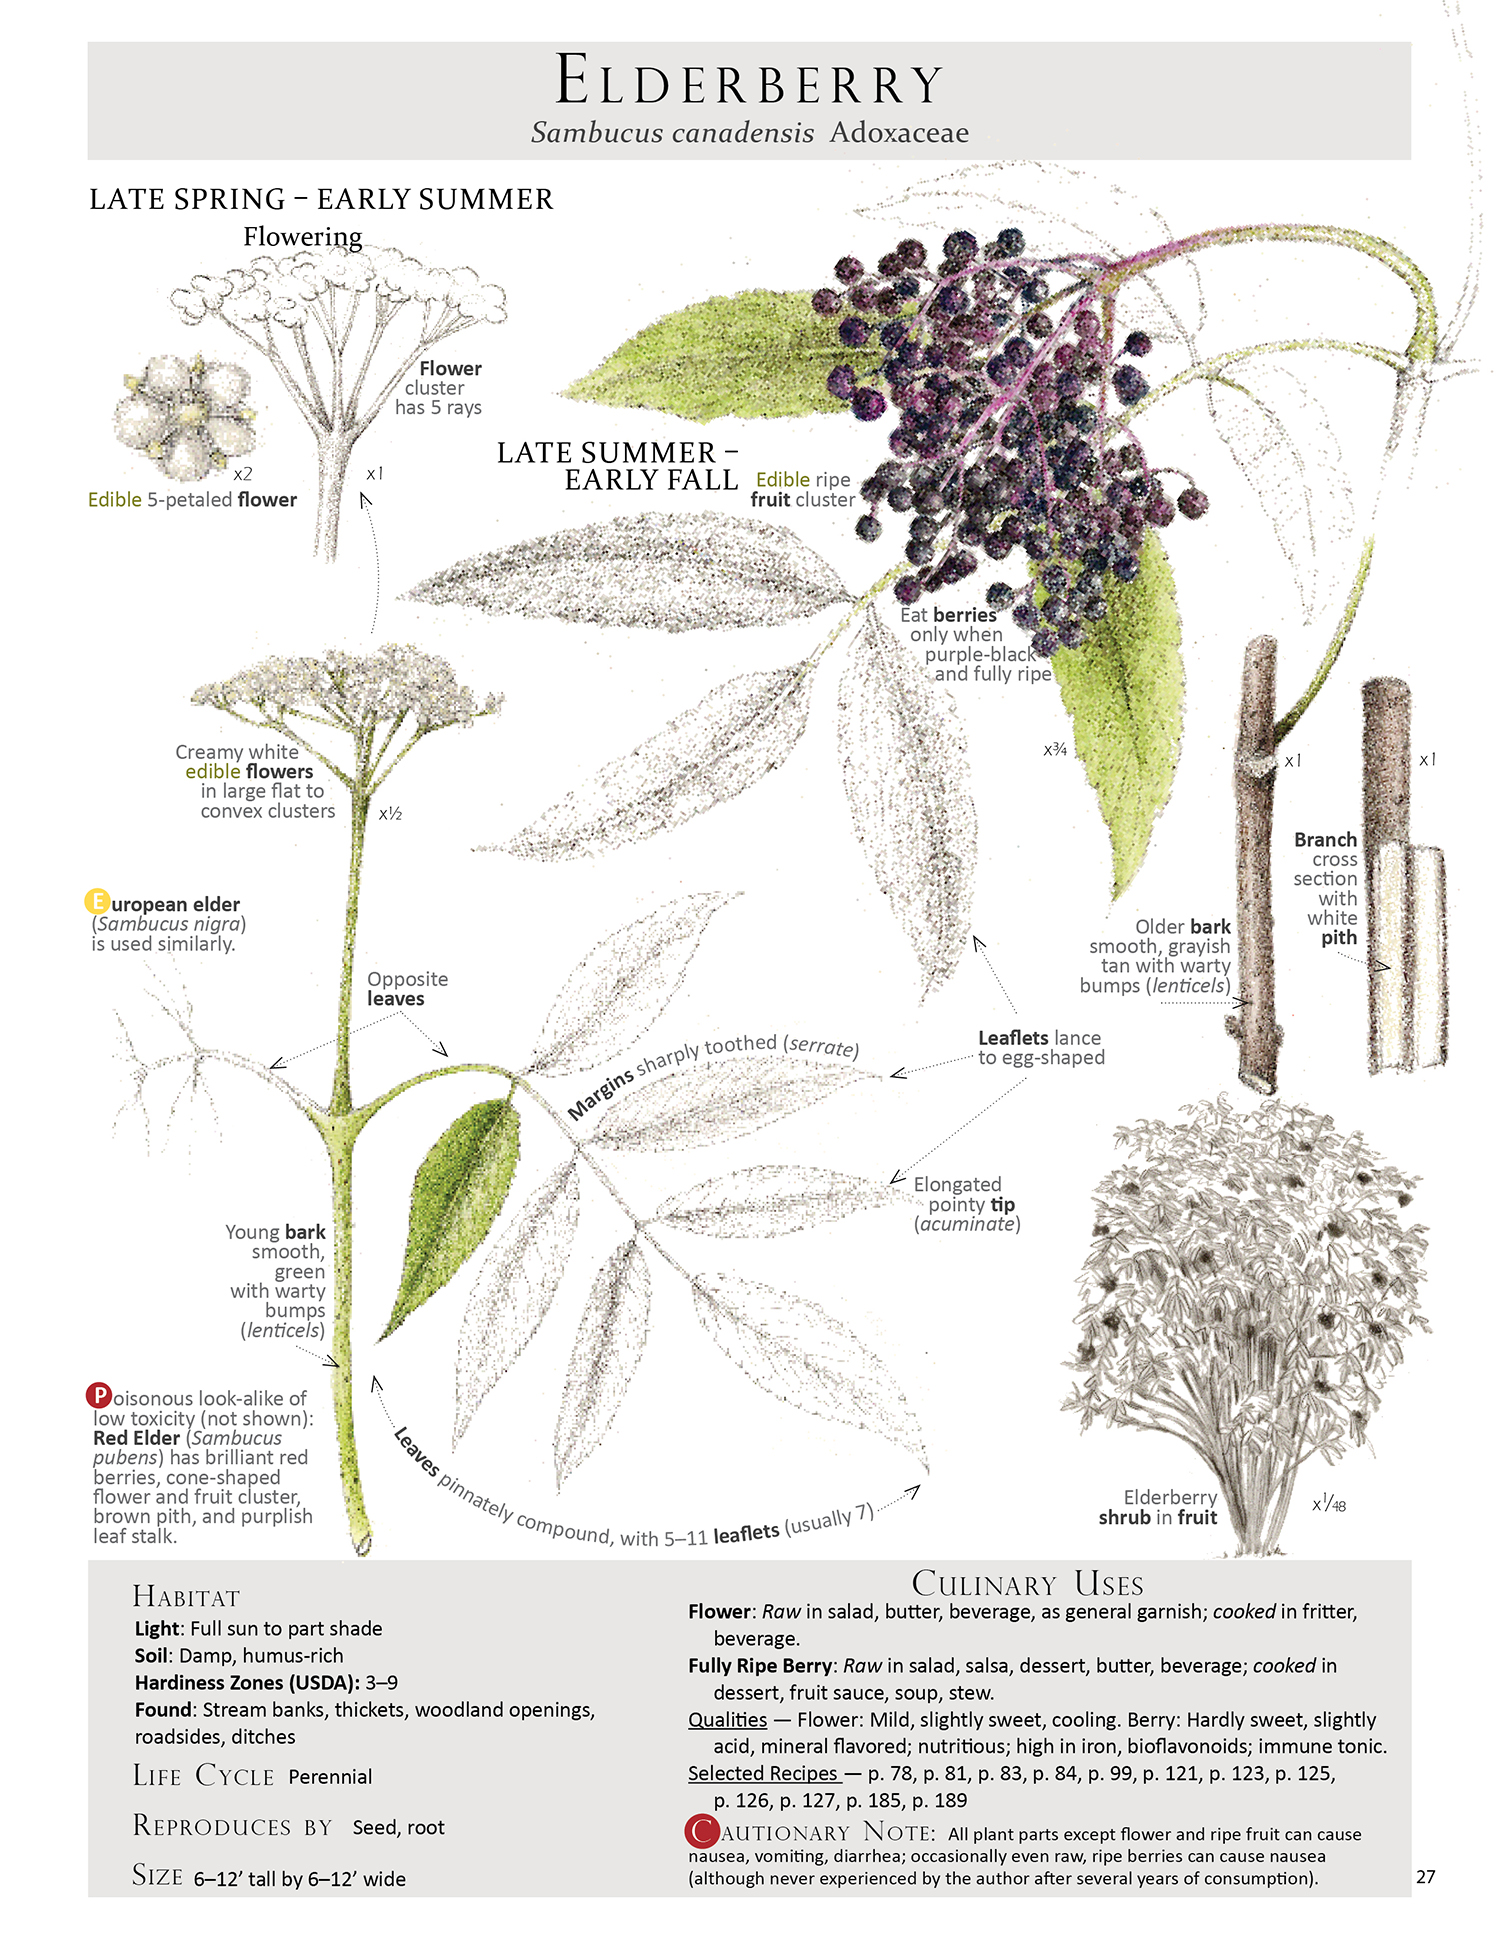 Elderberry - Sambucus canadensis